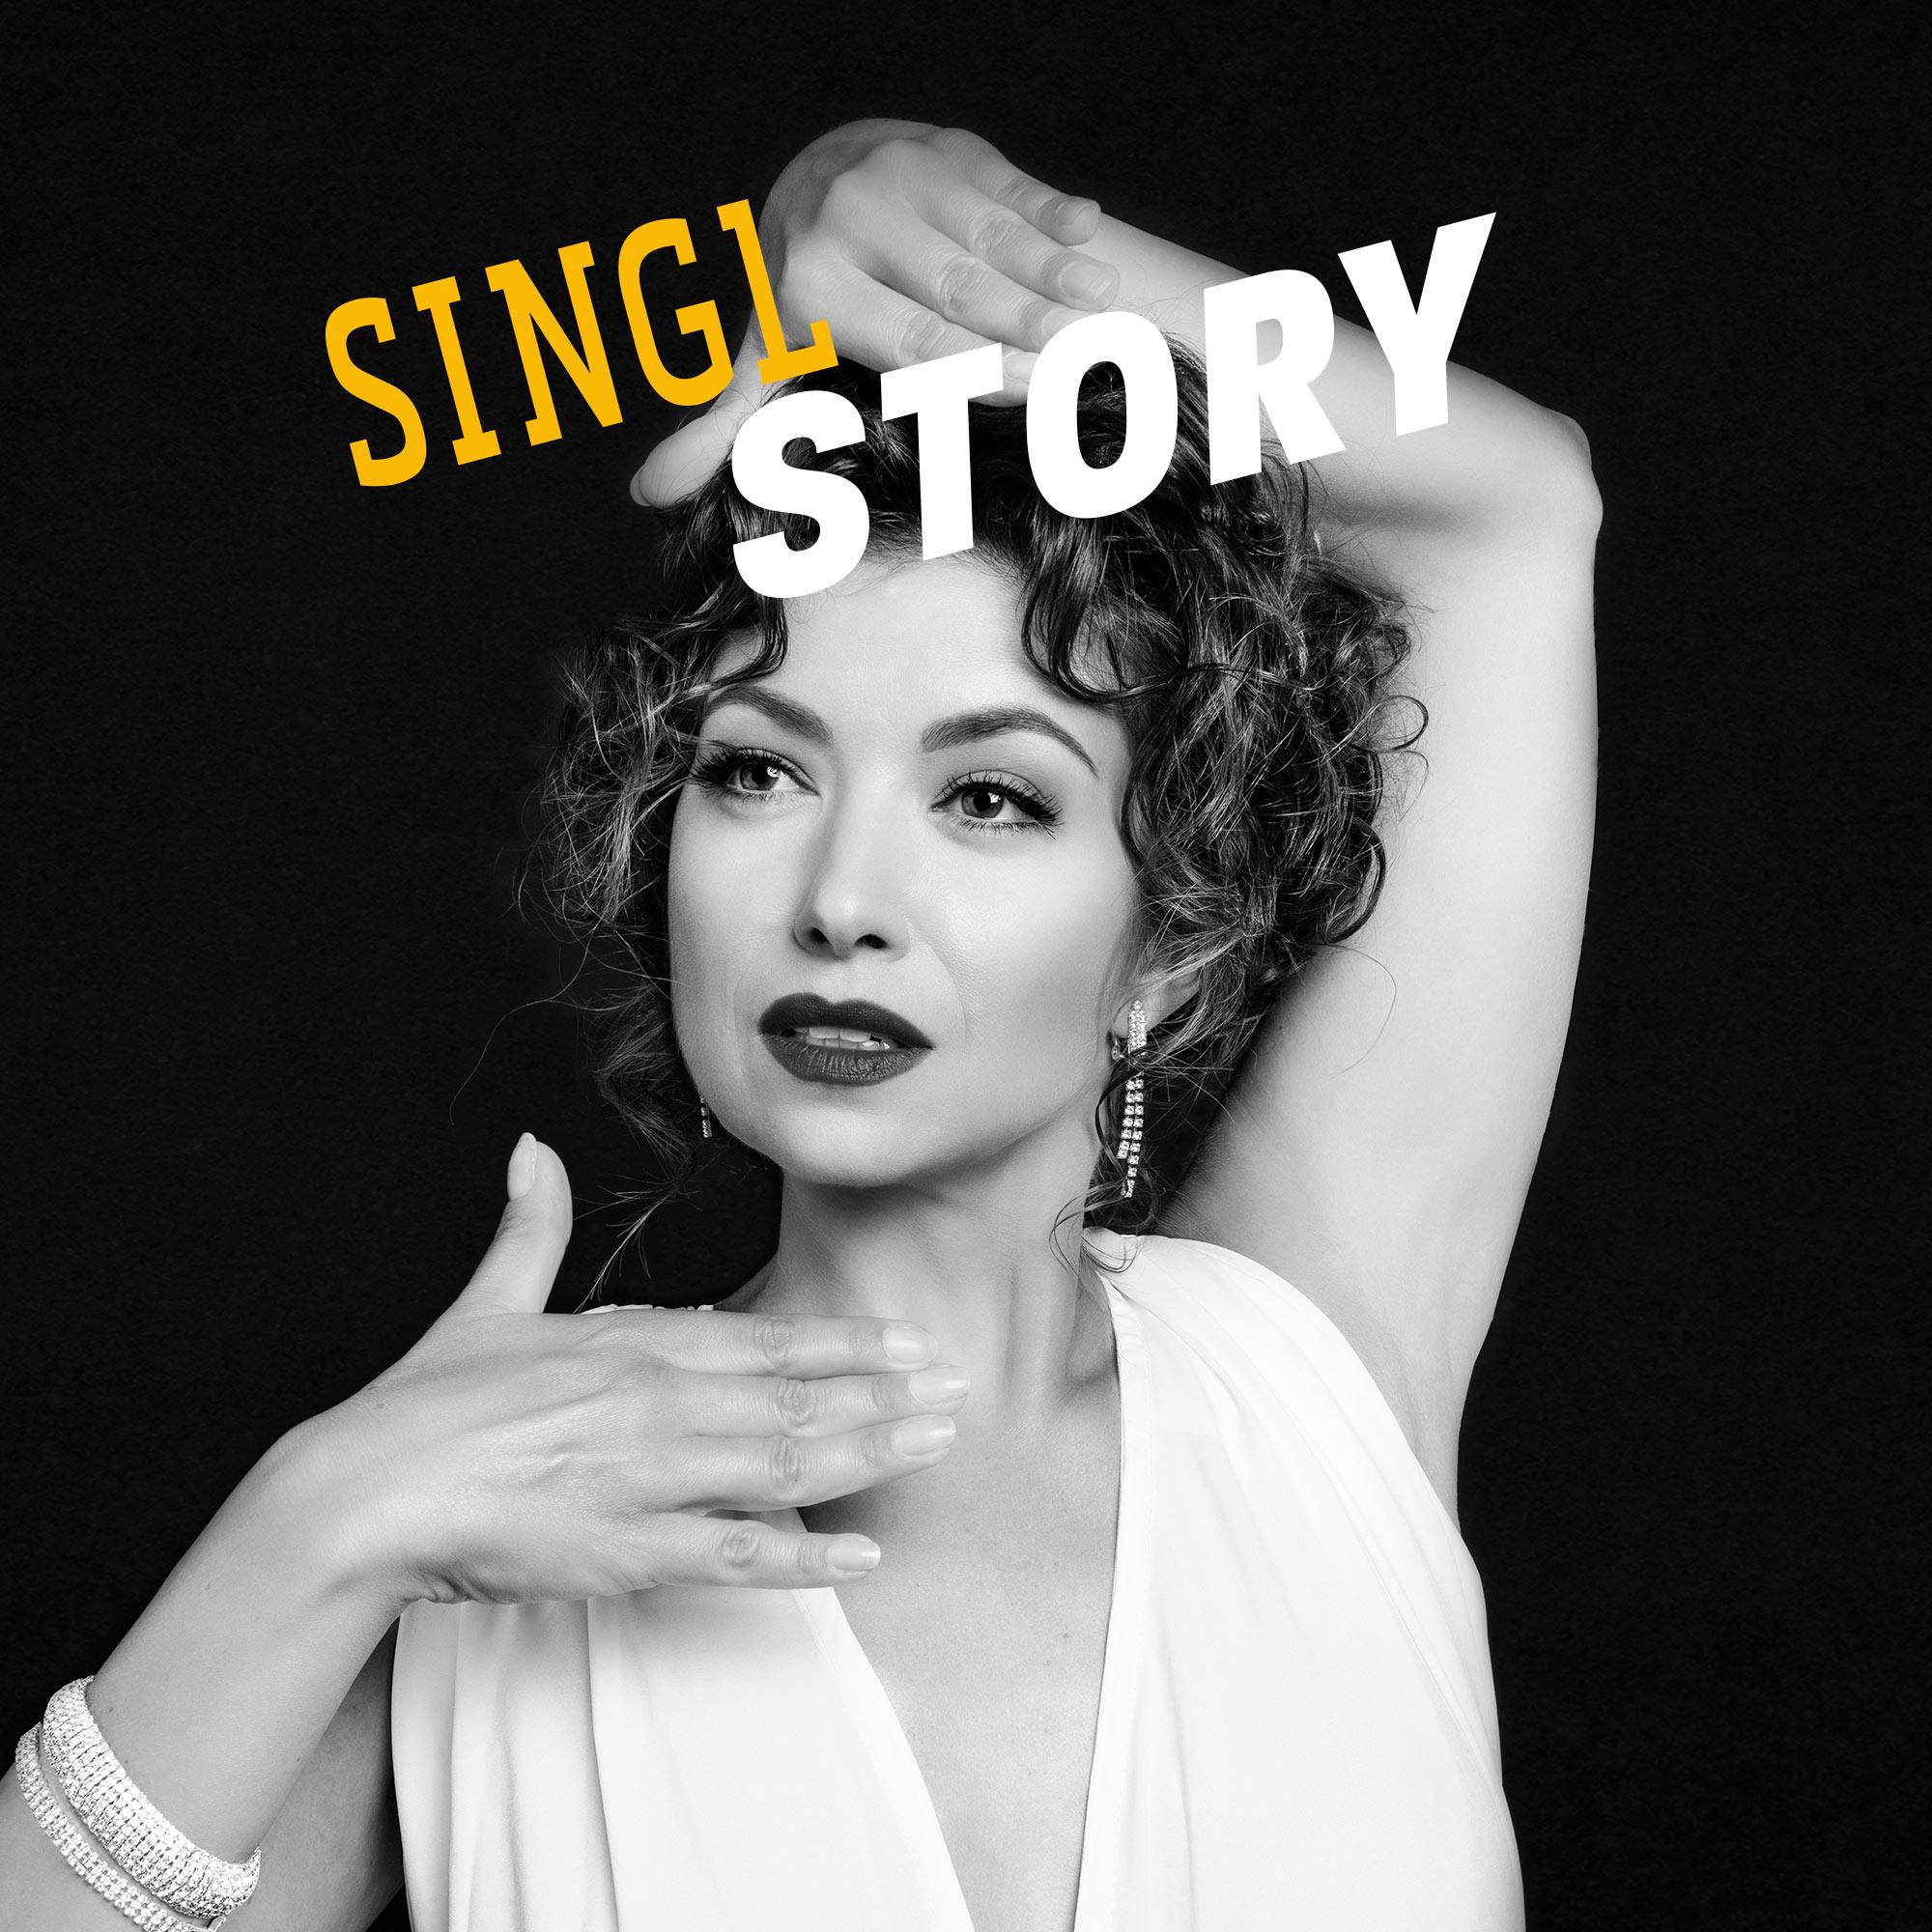 40. SinglStory